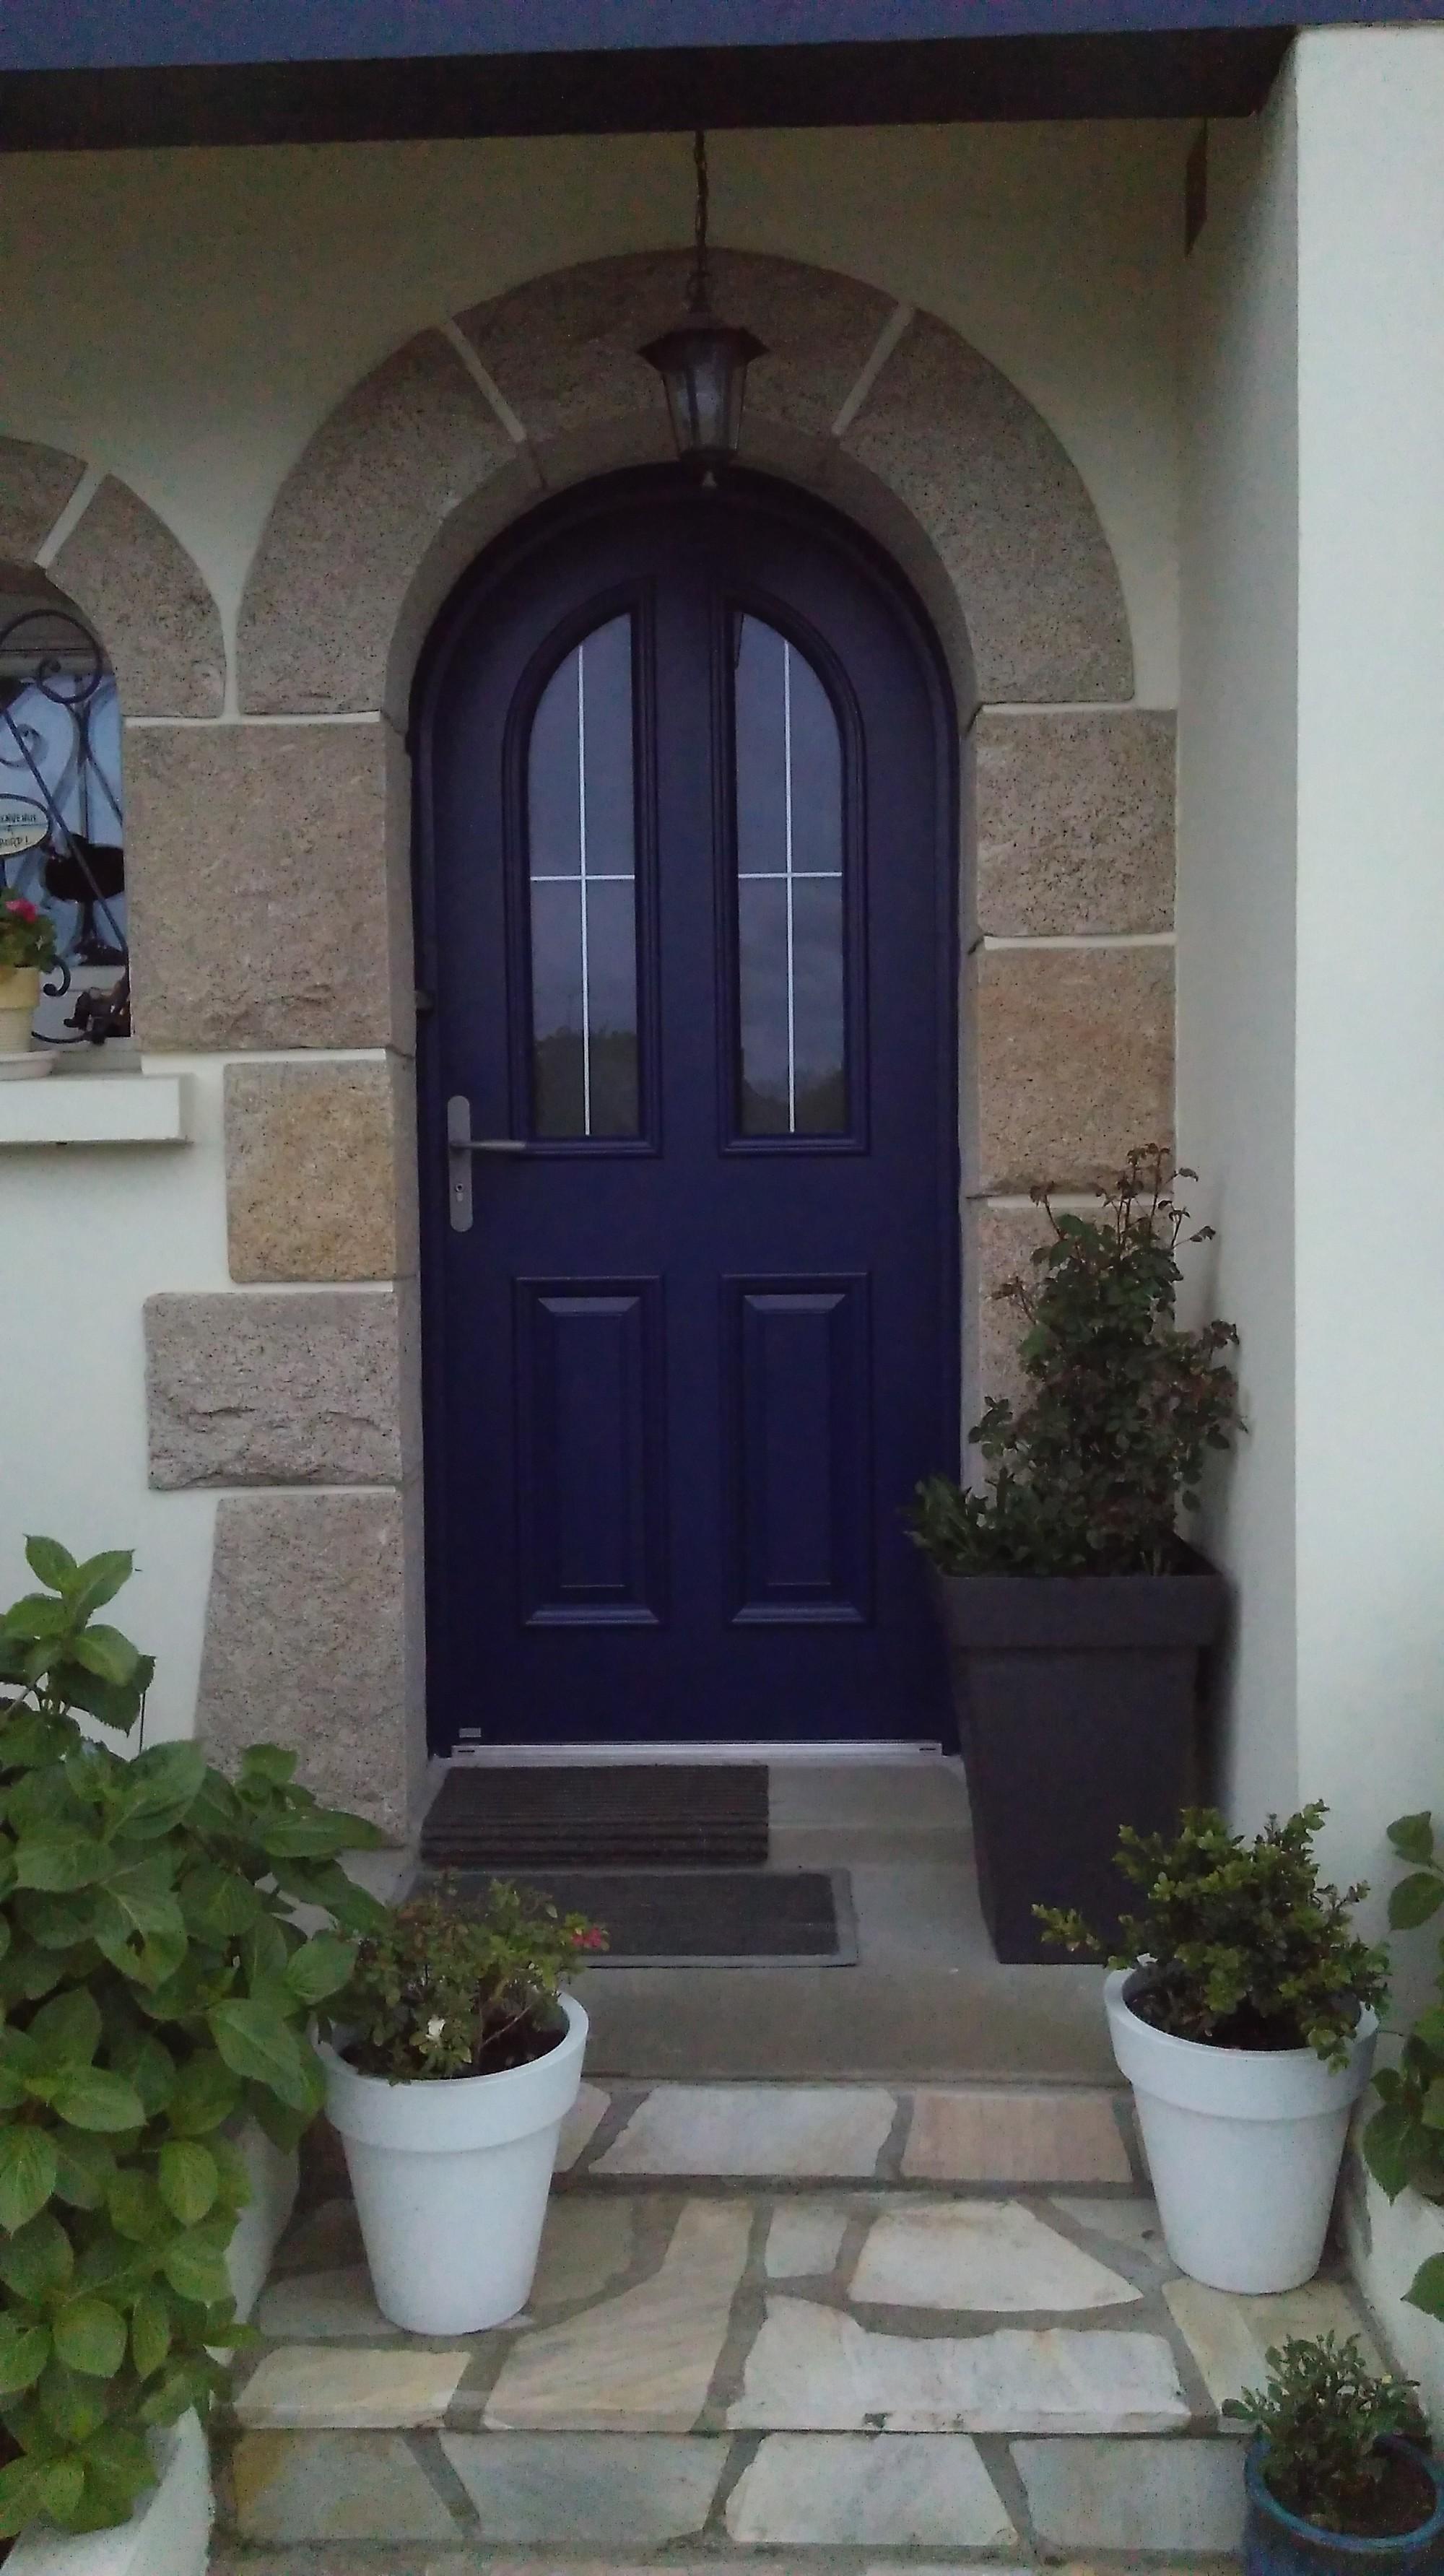 Porte d 39 entr e bleu alu mixte cintr e saint julien - Porte d entree cintree ...